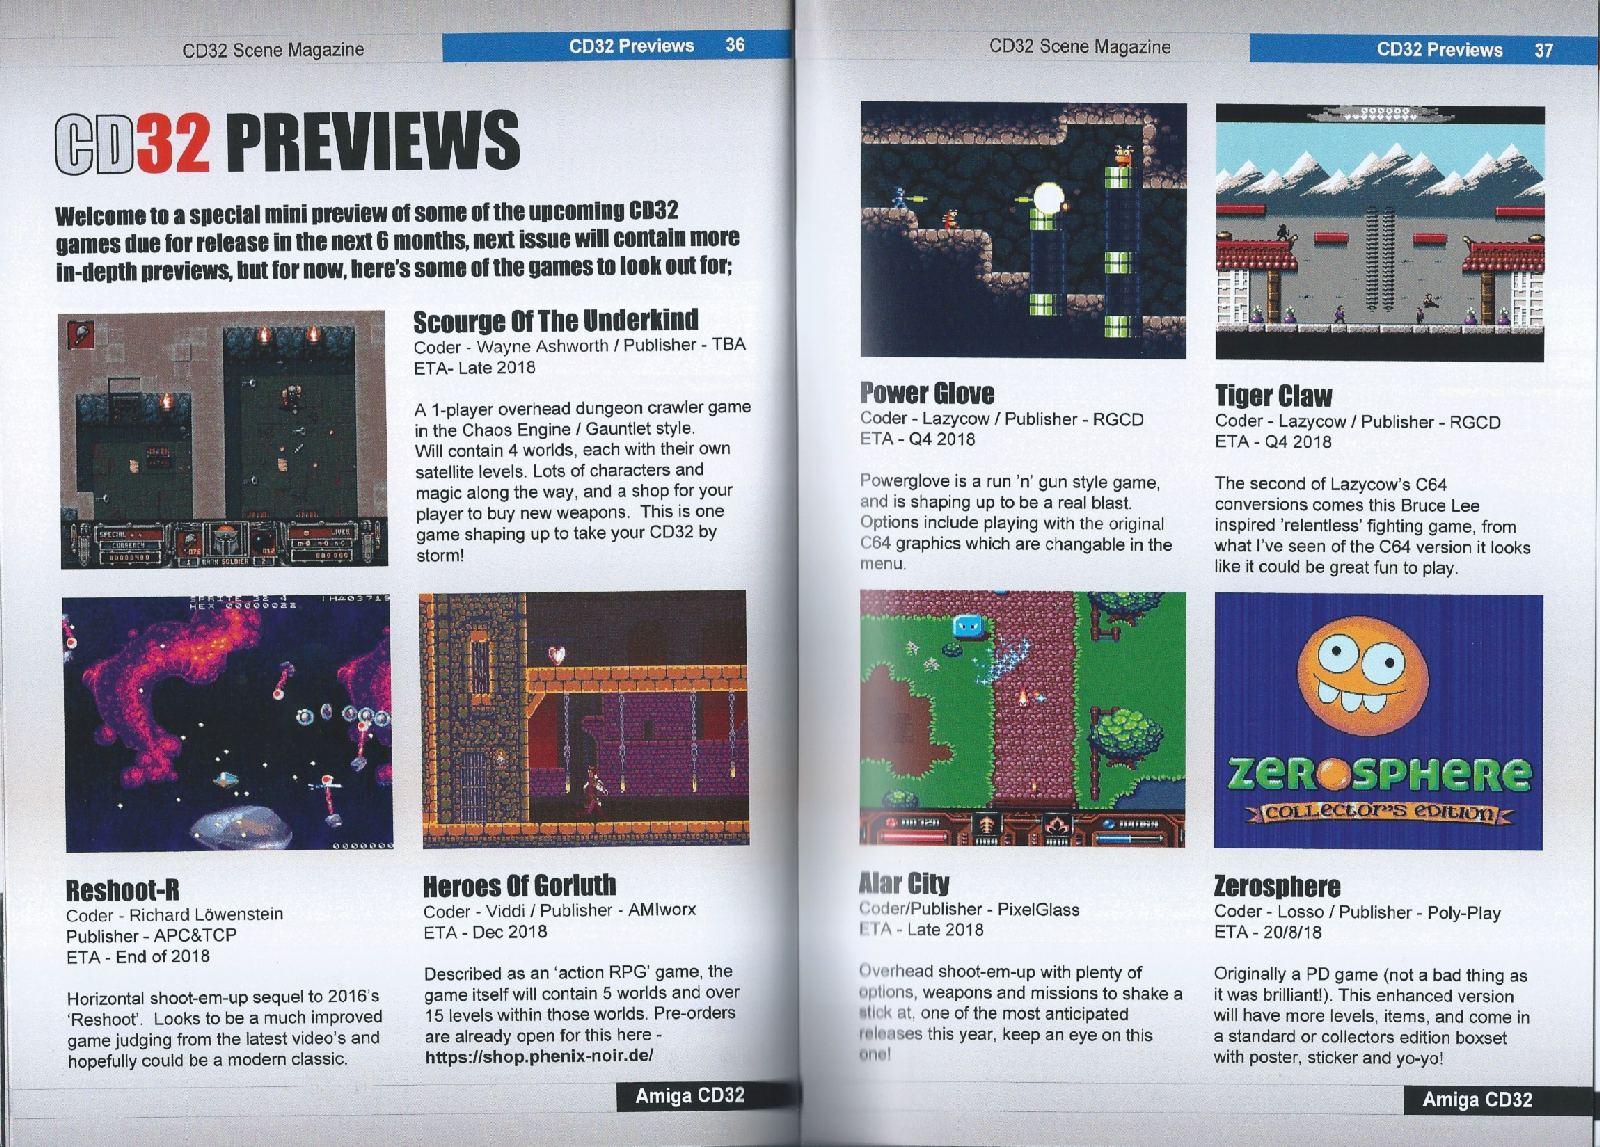 CD32 Scene Magazine